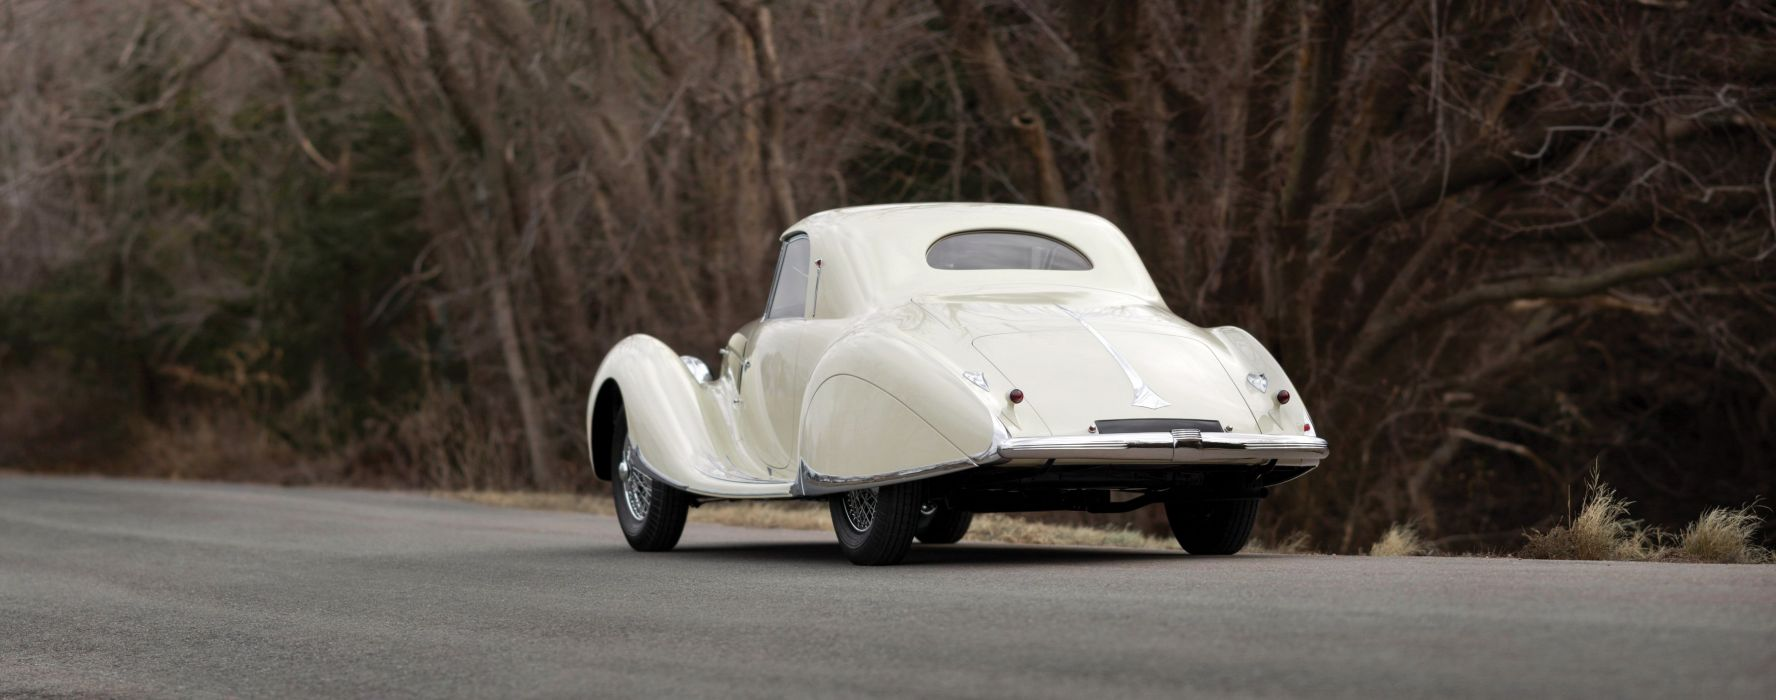 1938 Delahaye 135 M-S Coupe par Figoni Falaschi luxury retro wallpaper